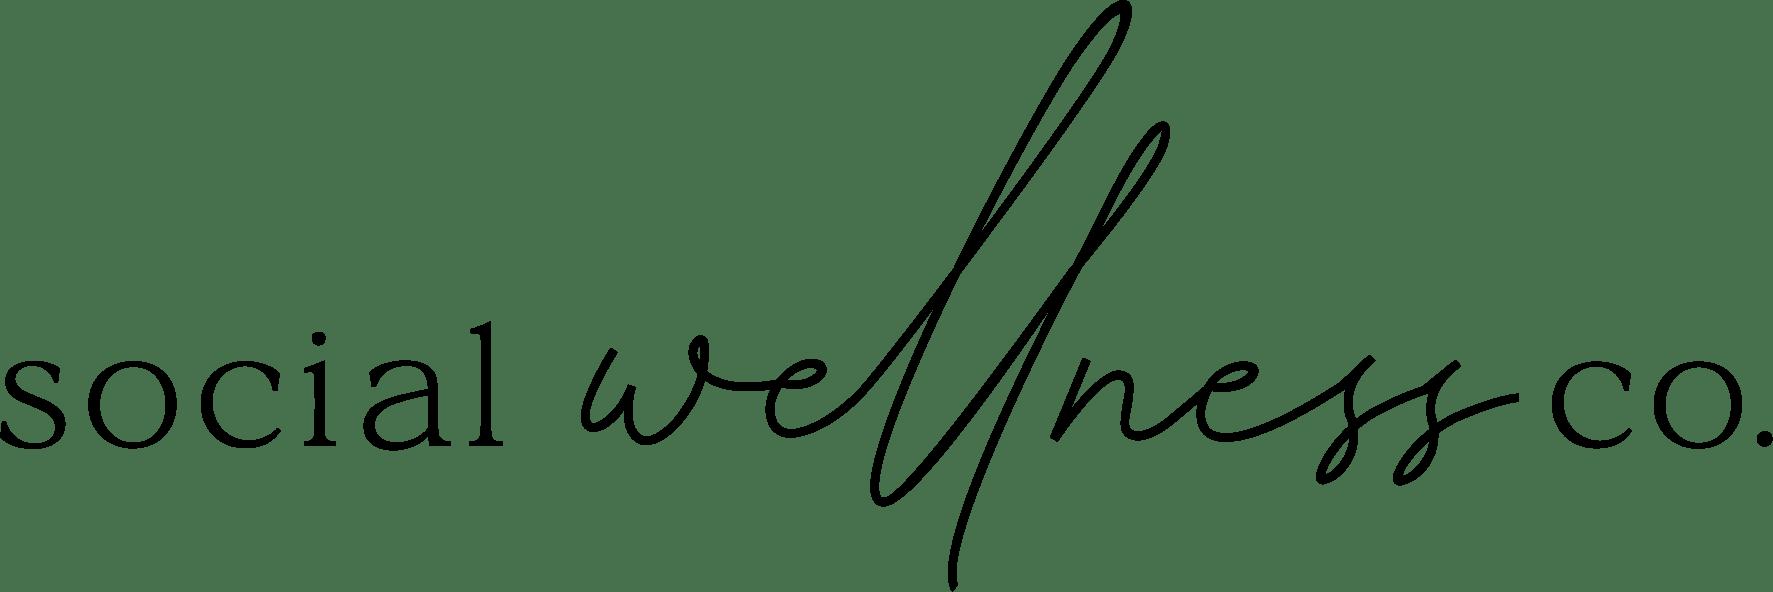 Social Wellness Co.